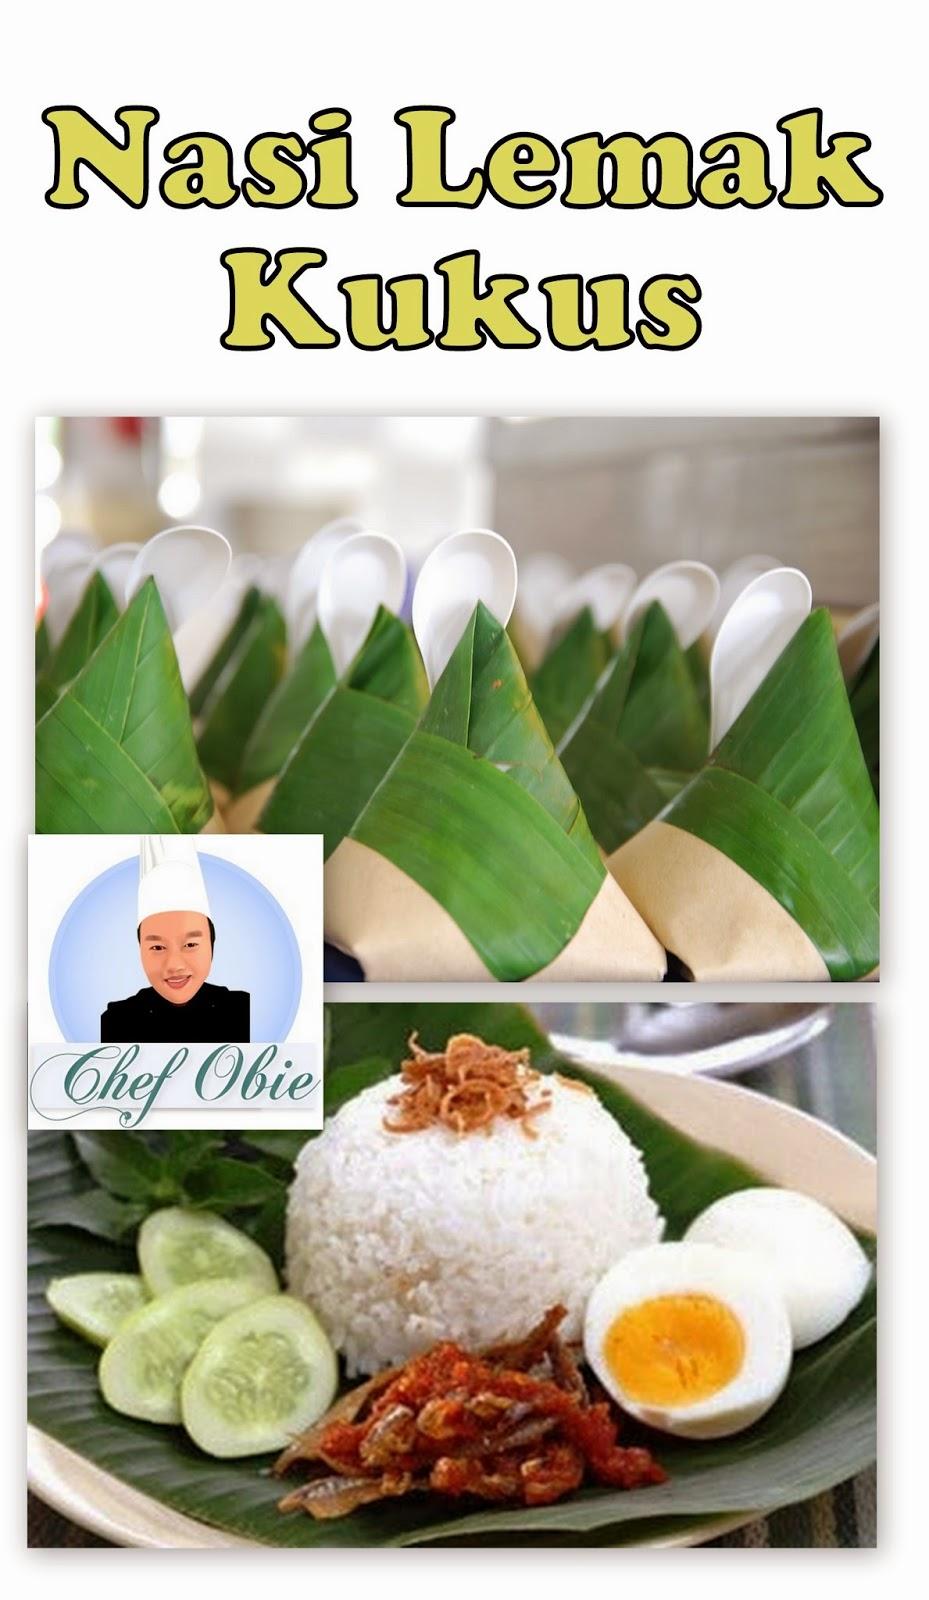 chef obie 1001 info dan resepi popular: Resepi Rempah Ratus